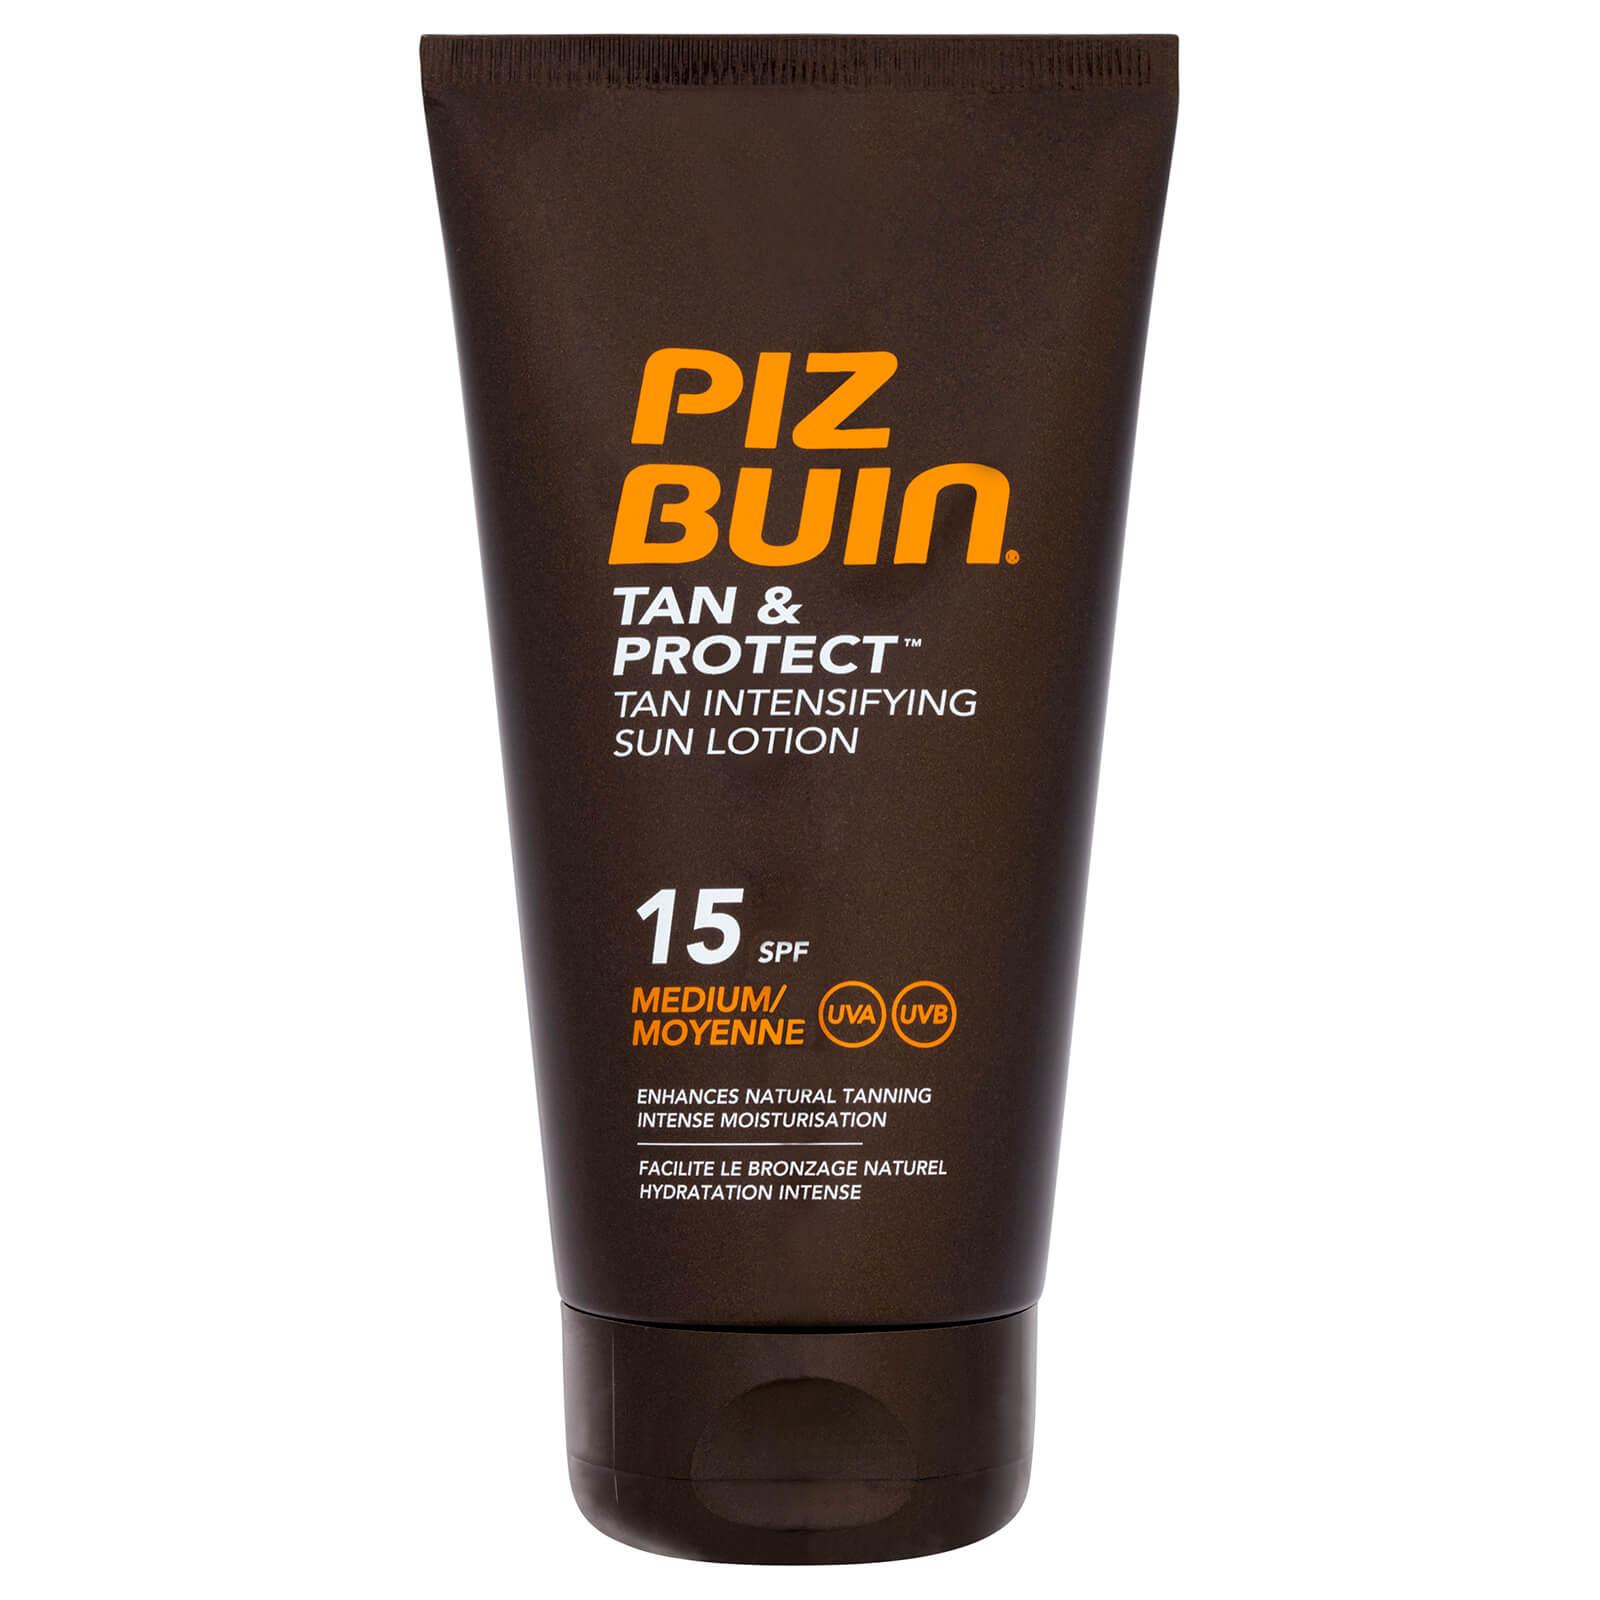 Piz Buin Crème Solaire Protectrice Intensificateur de Bronzage Tan & Protect Piz Buin – Protection Moyenne SPF15 150ml